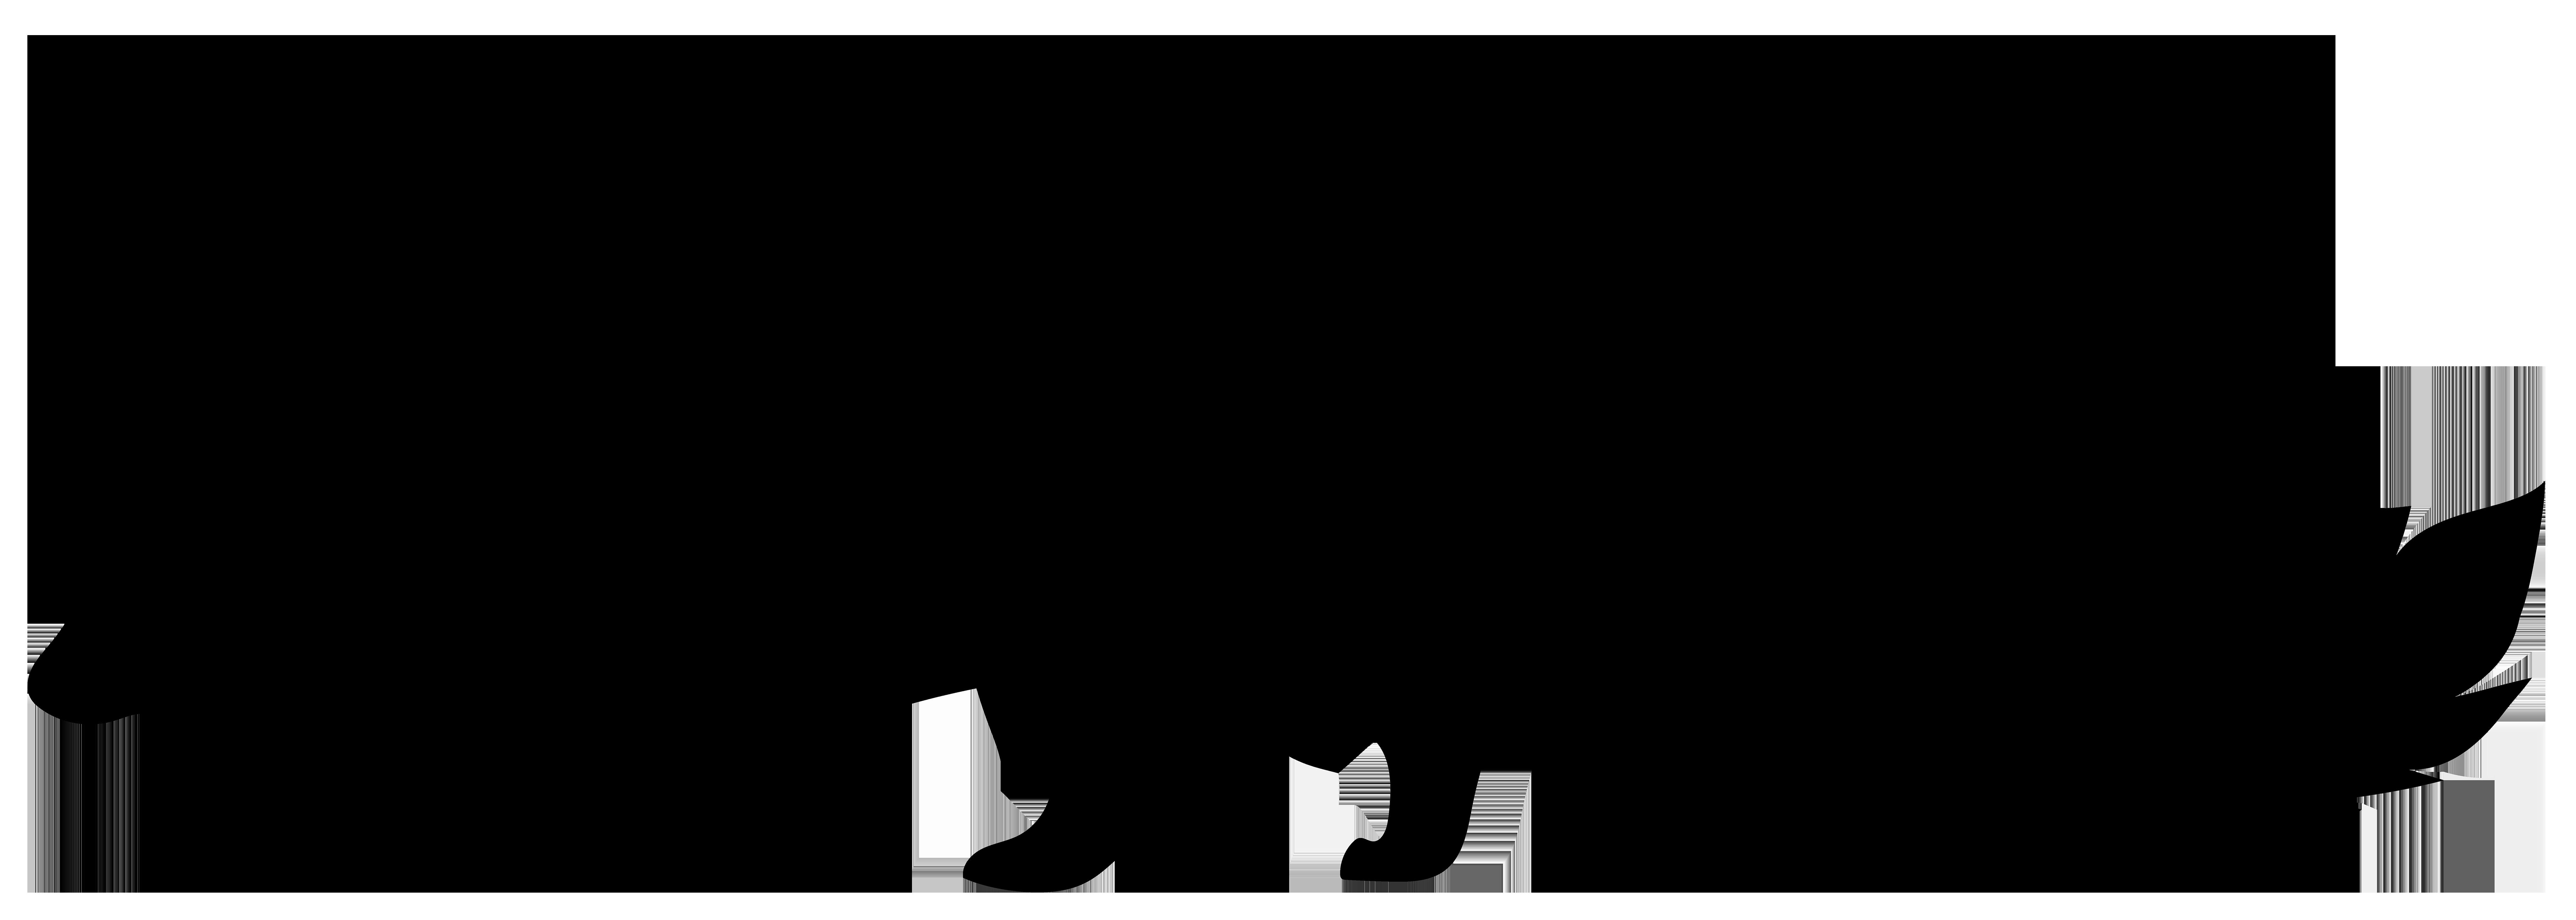 Skunk Silhouette PNG Transparent Clip Art Image.